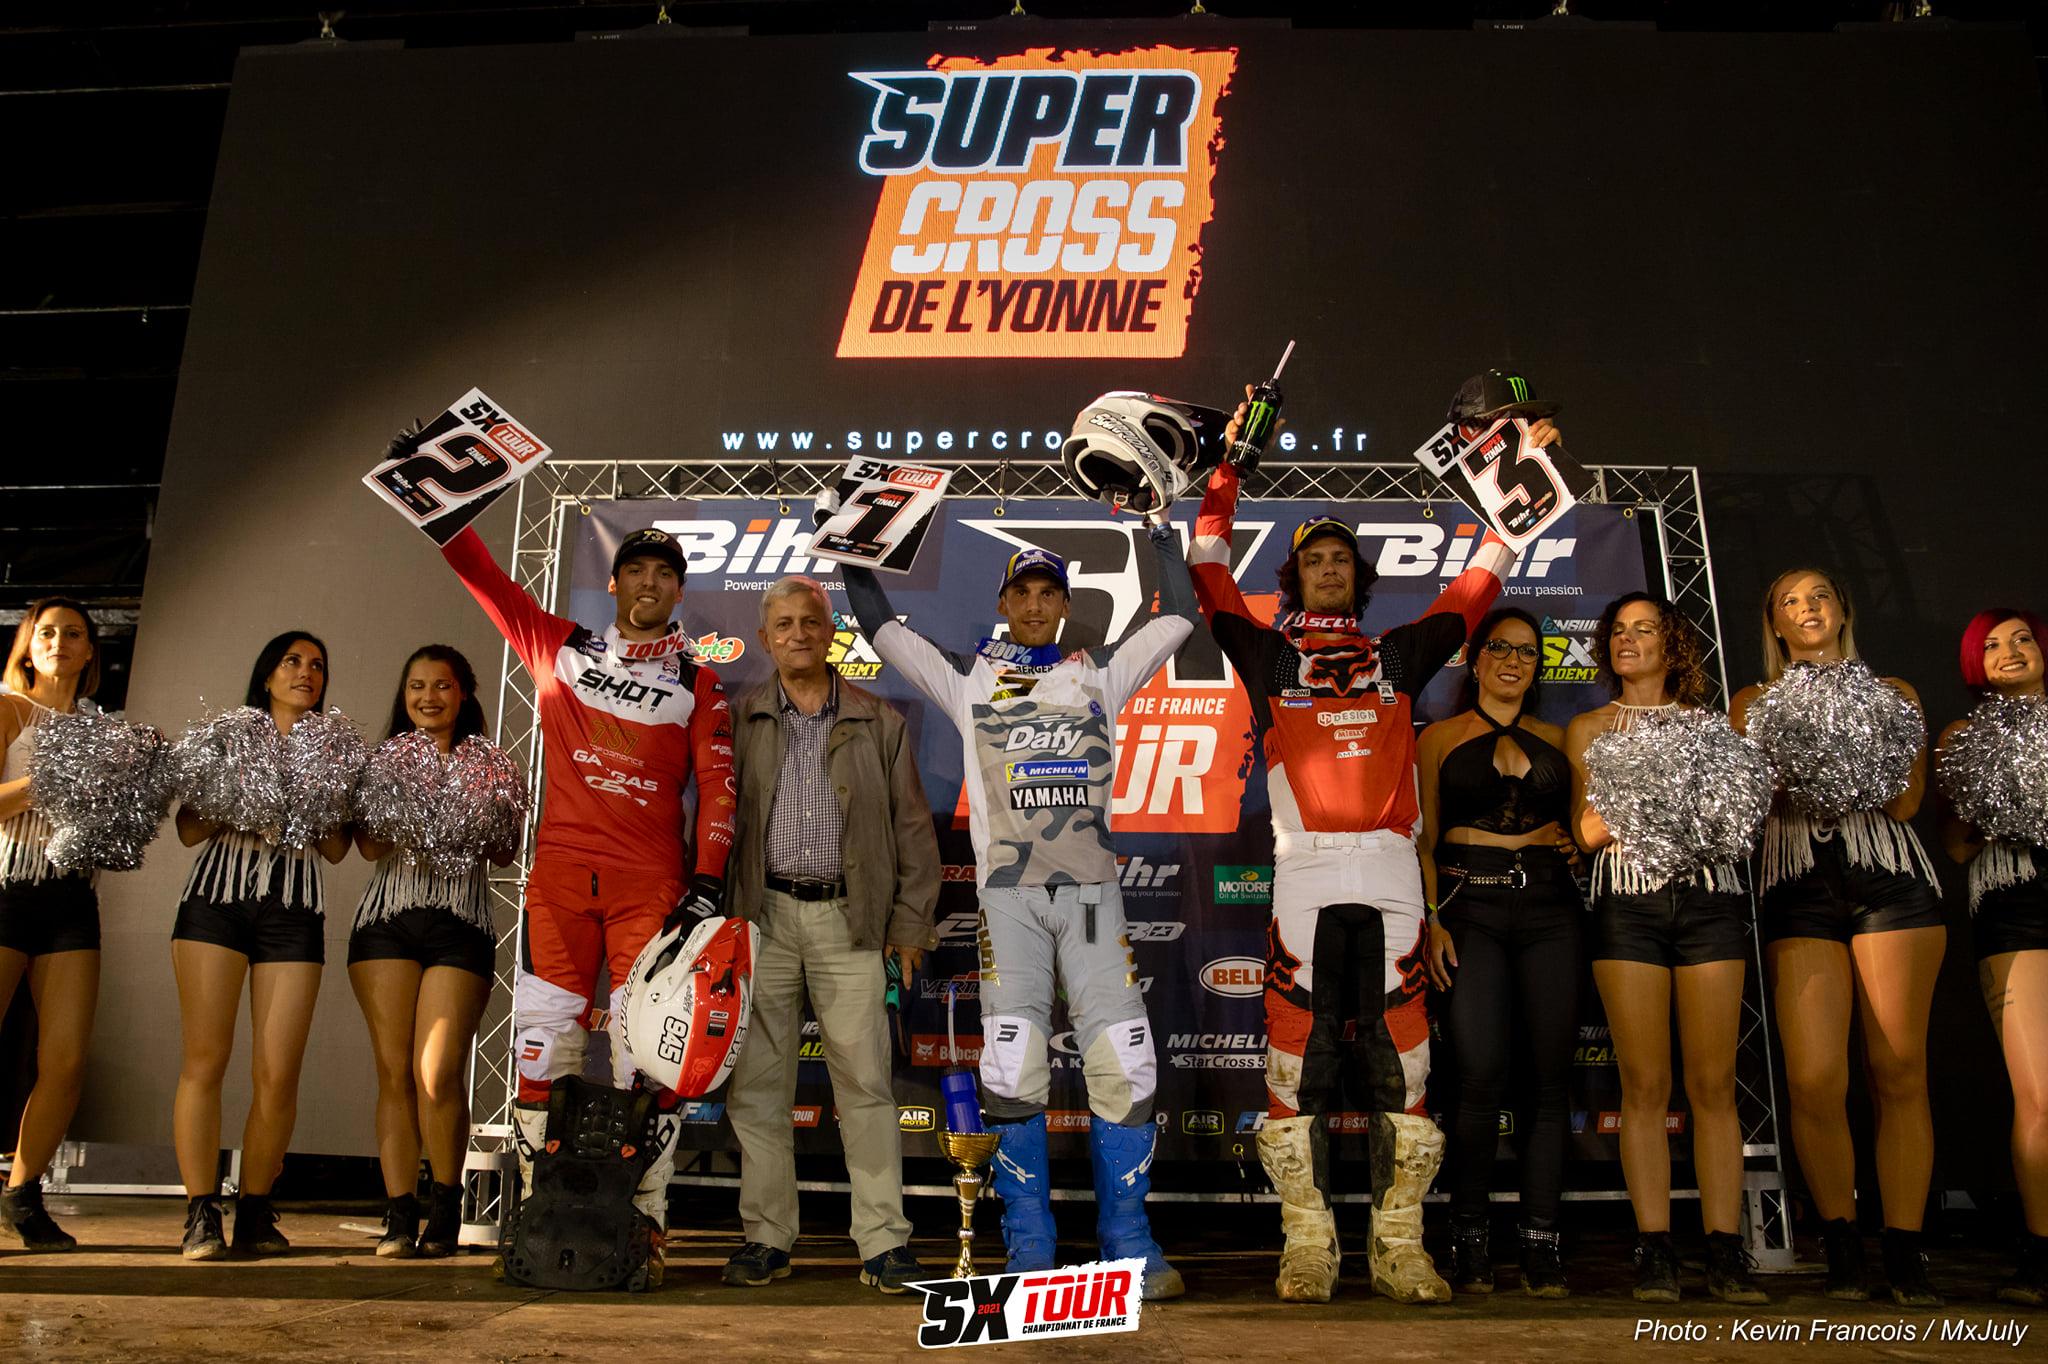 Supercross de l'Yonne 2021 -  Superfinale